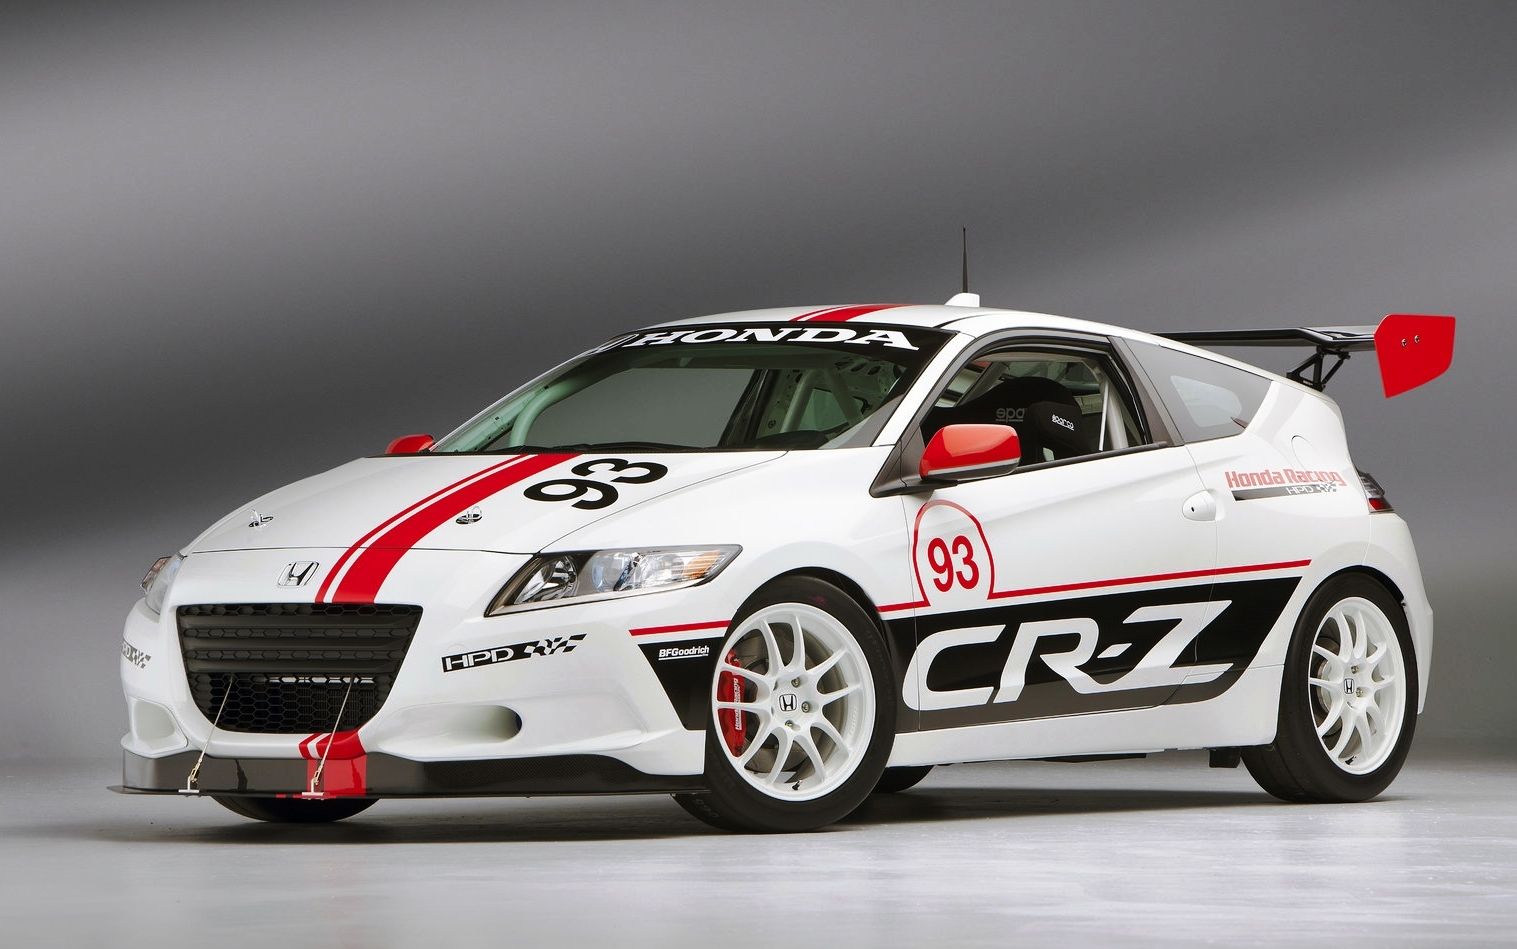 Honda CR-Z Hybrid Race Car Promotion at Le Mans Event Front Left Desktop Backgrounds